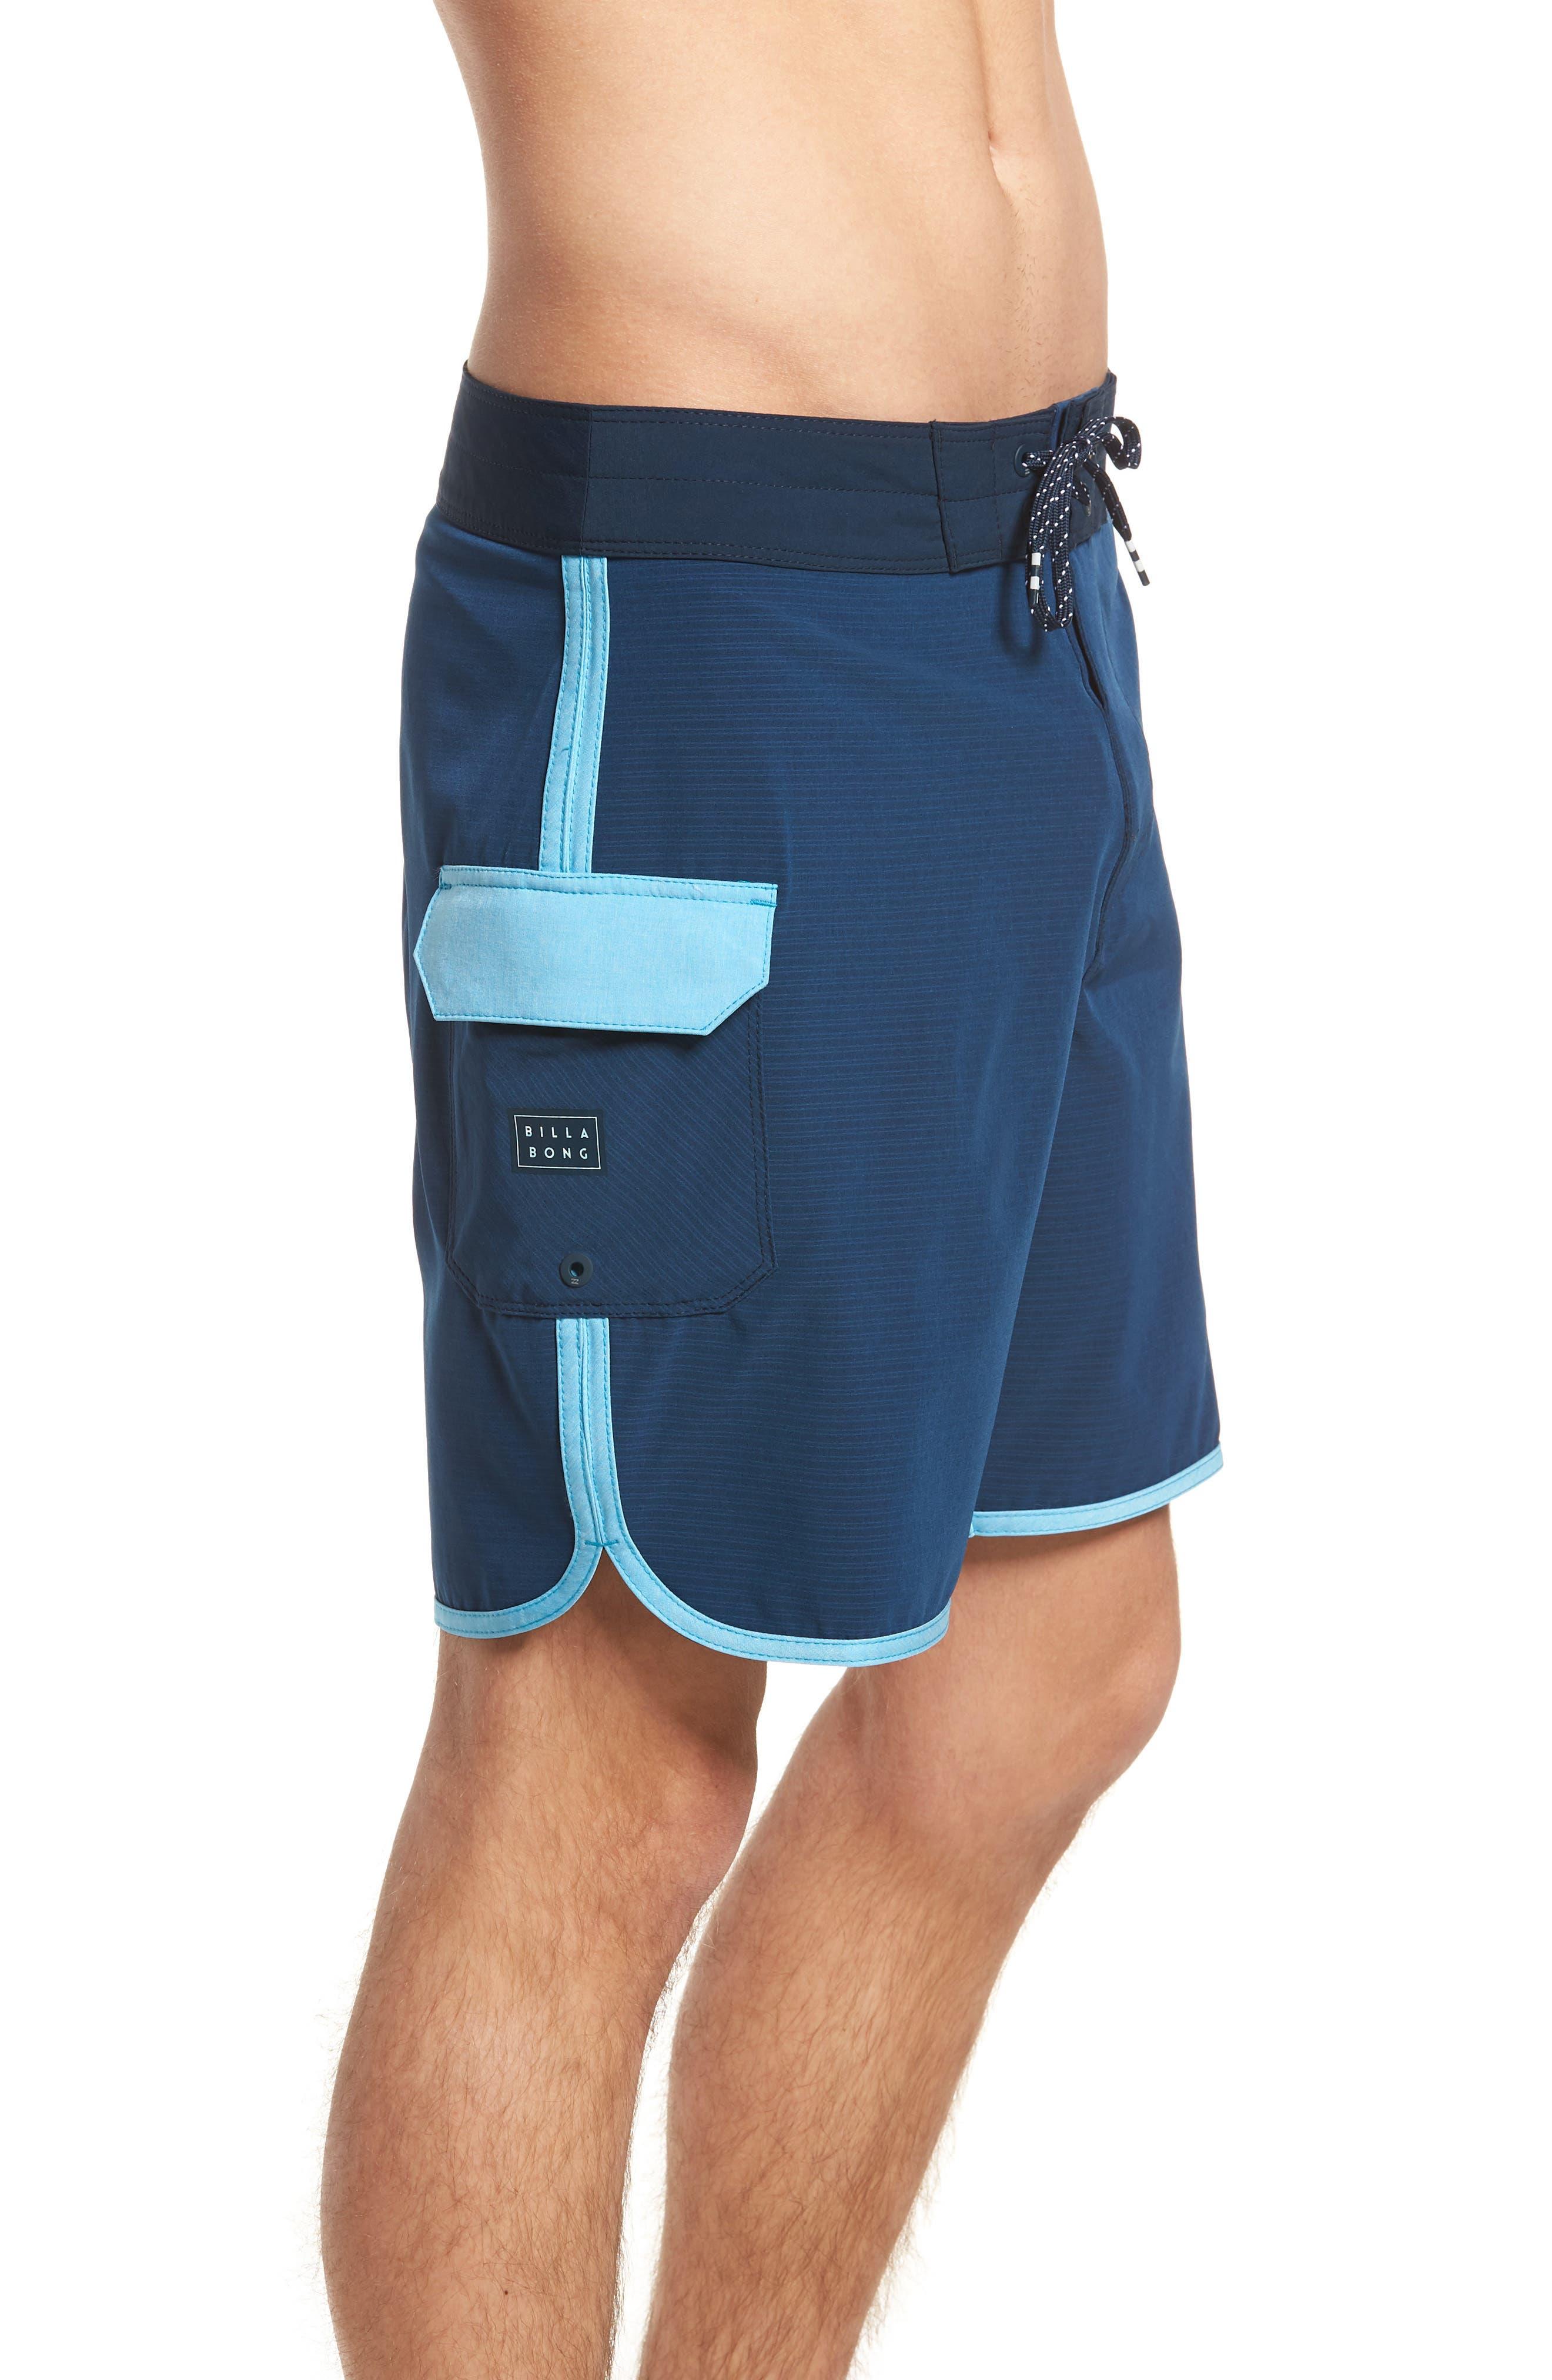 73 X Short Board Shorts,                             Alternate thumbnail 4, color,                             Navy